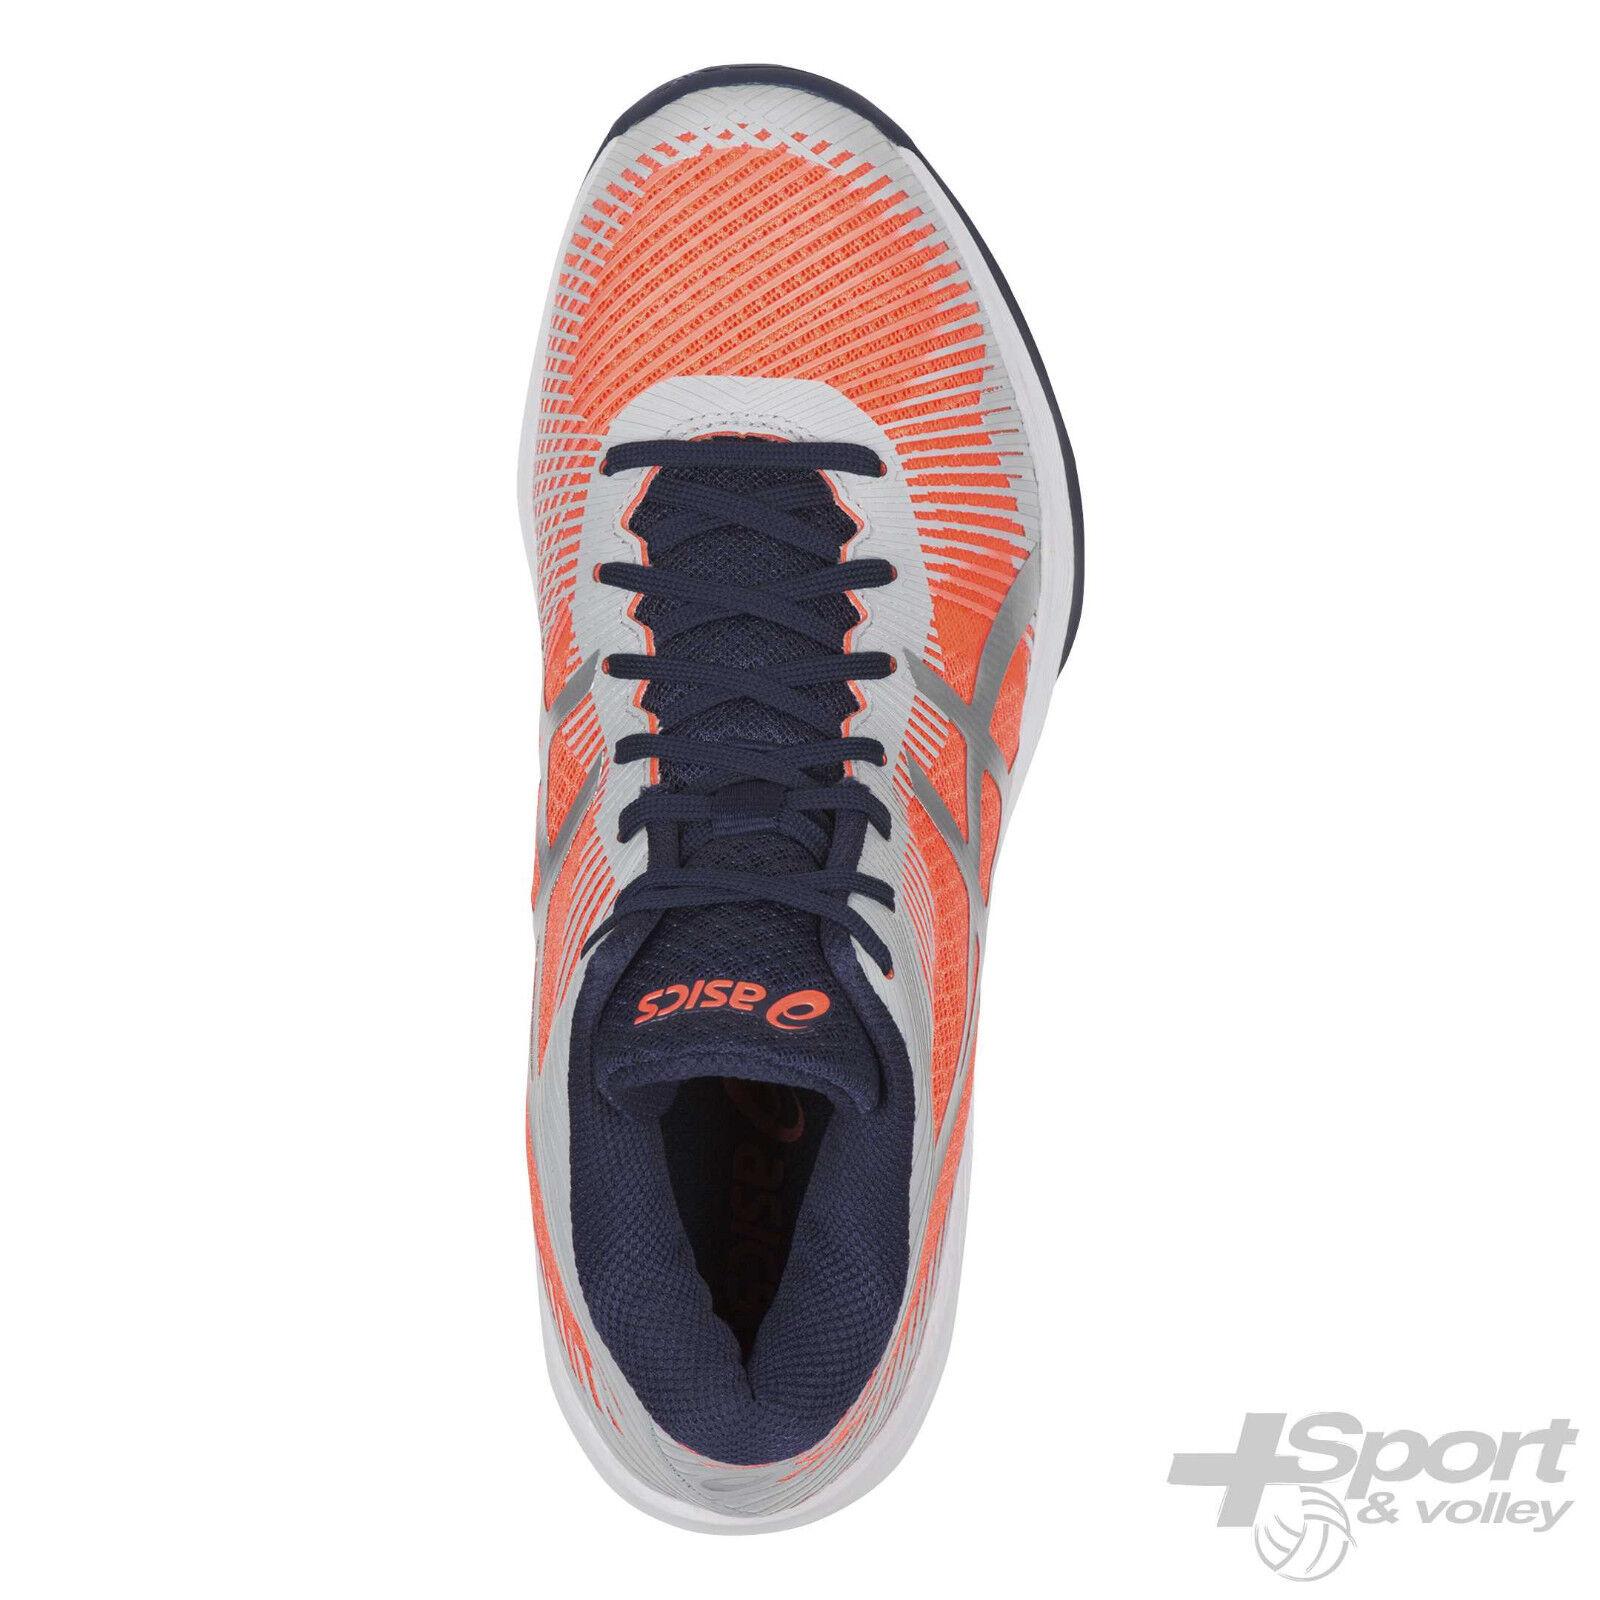 Scarpa volley Asics Volley Elite Elite Elite FF Mid Donna B750N 0696 bc7cdd